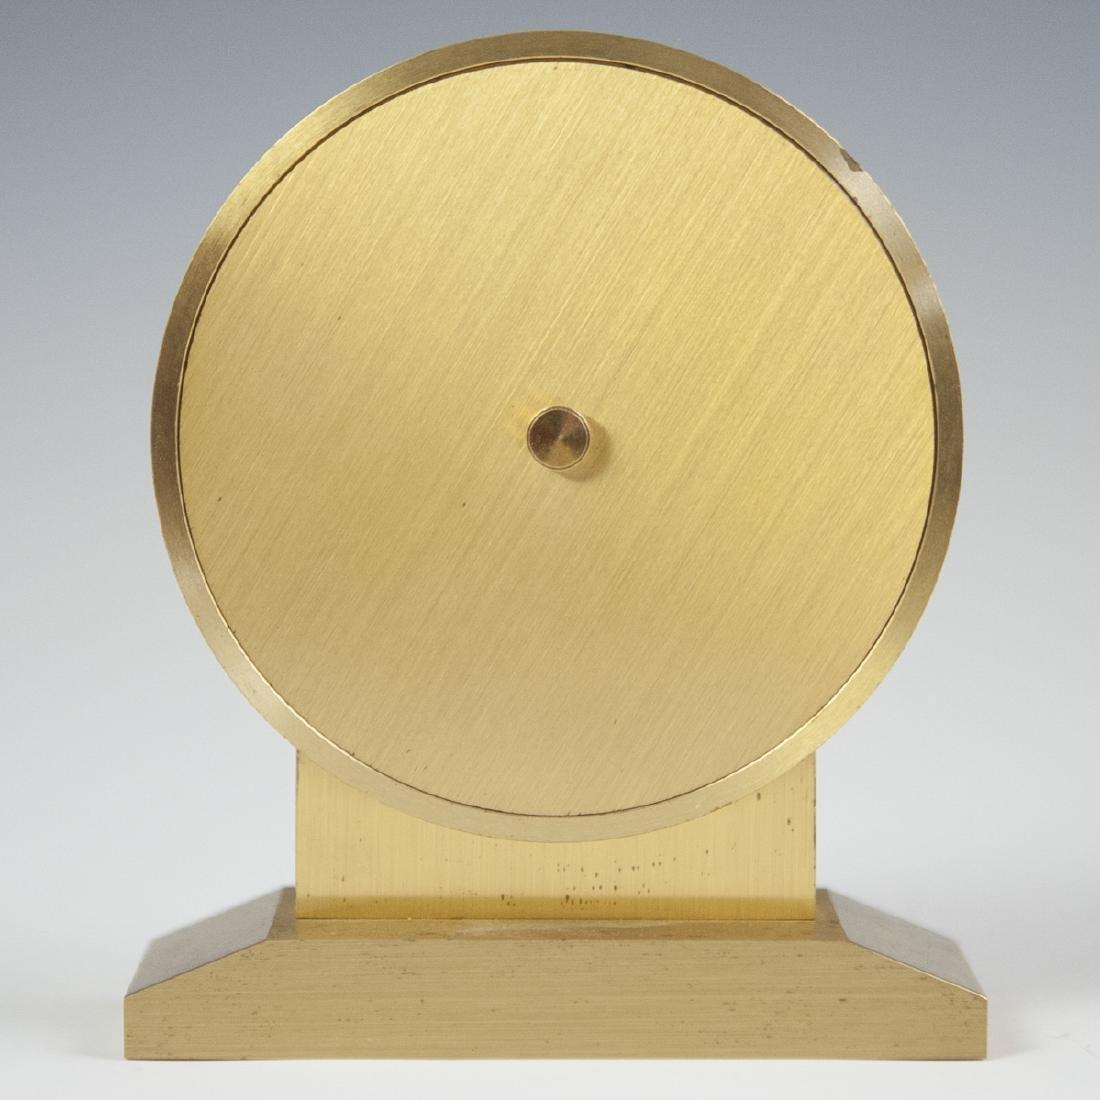 Tiffany & Co. Gilt Brass Desk Clock - 5